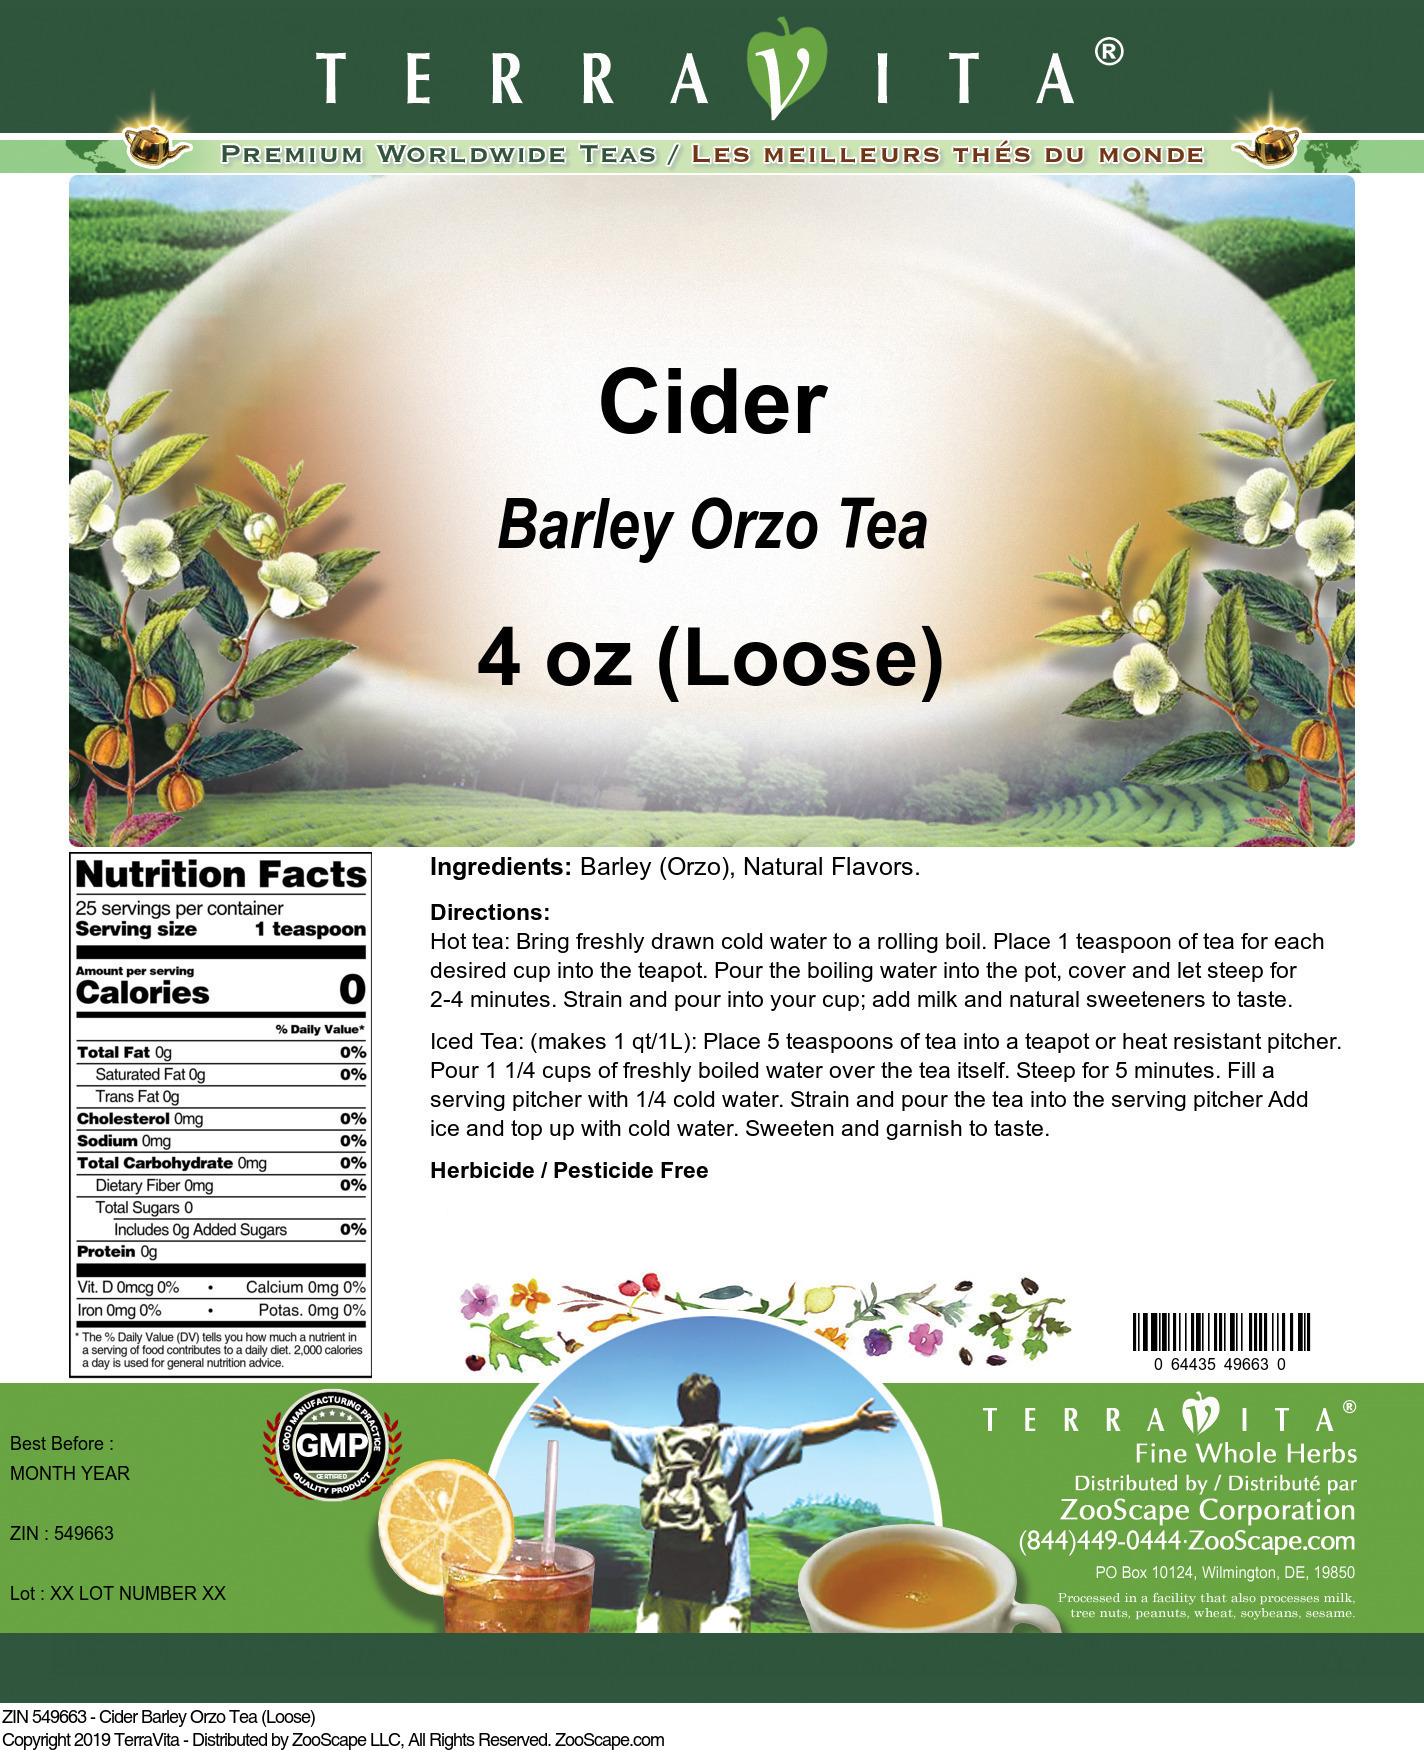 Cider Barley Orzo Tea (Loose)